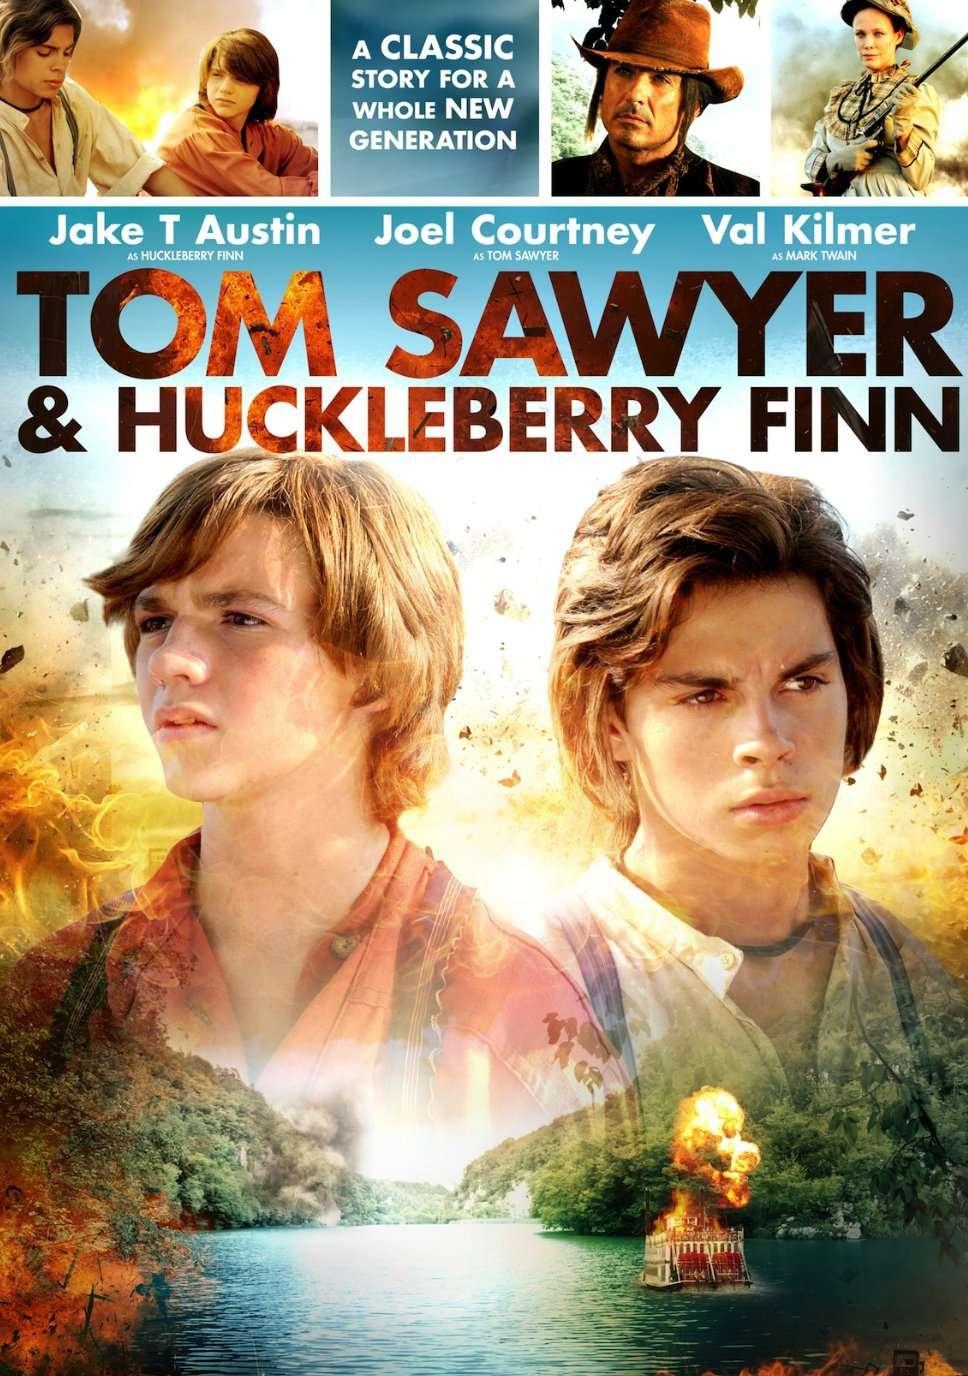 Tom Sawyer & Huckleberry Finn kapak